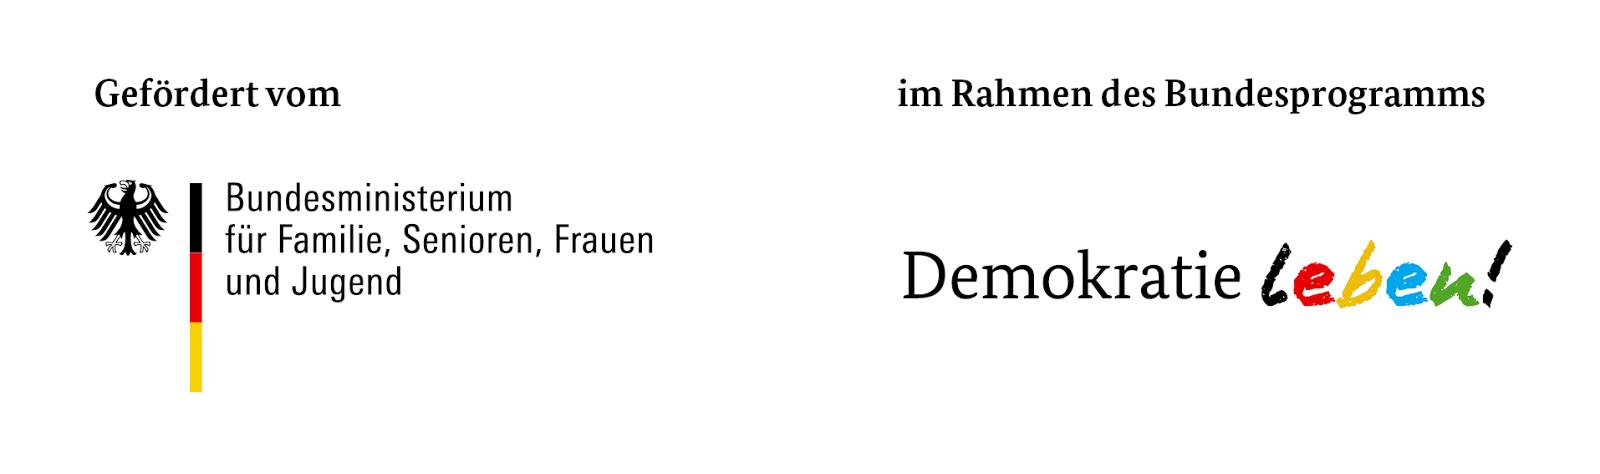 Lokale Partnerschaft für Demokratie Jena